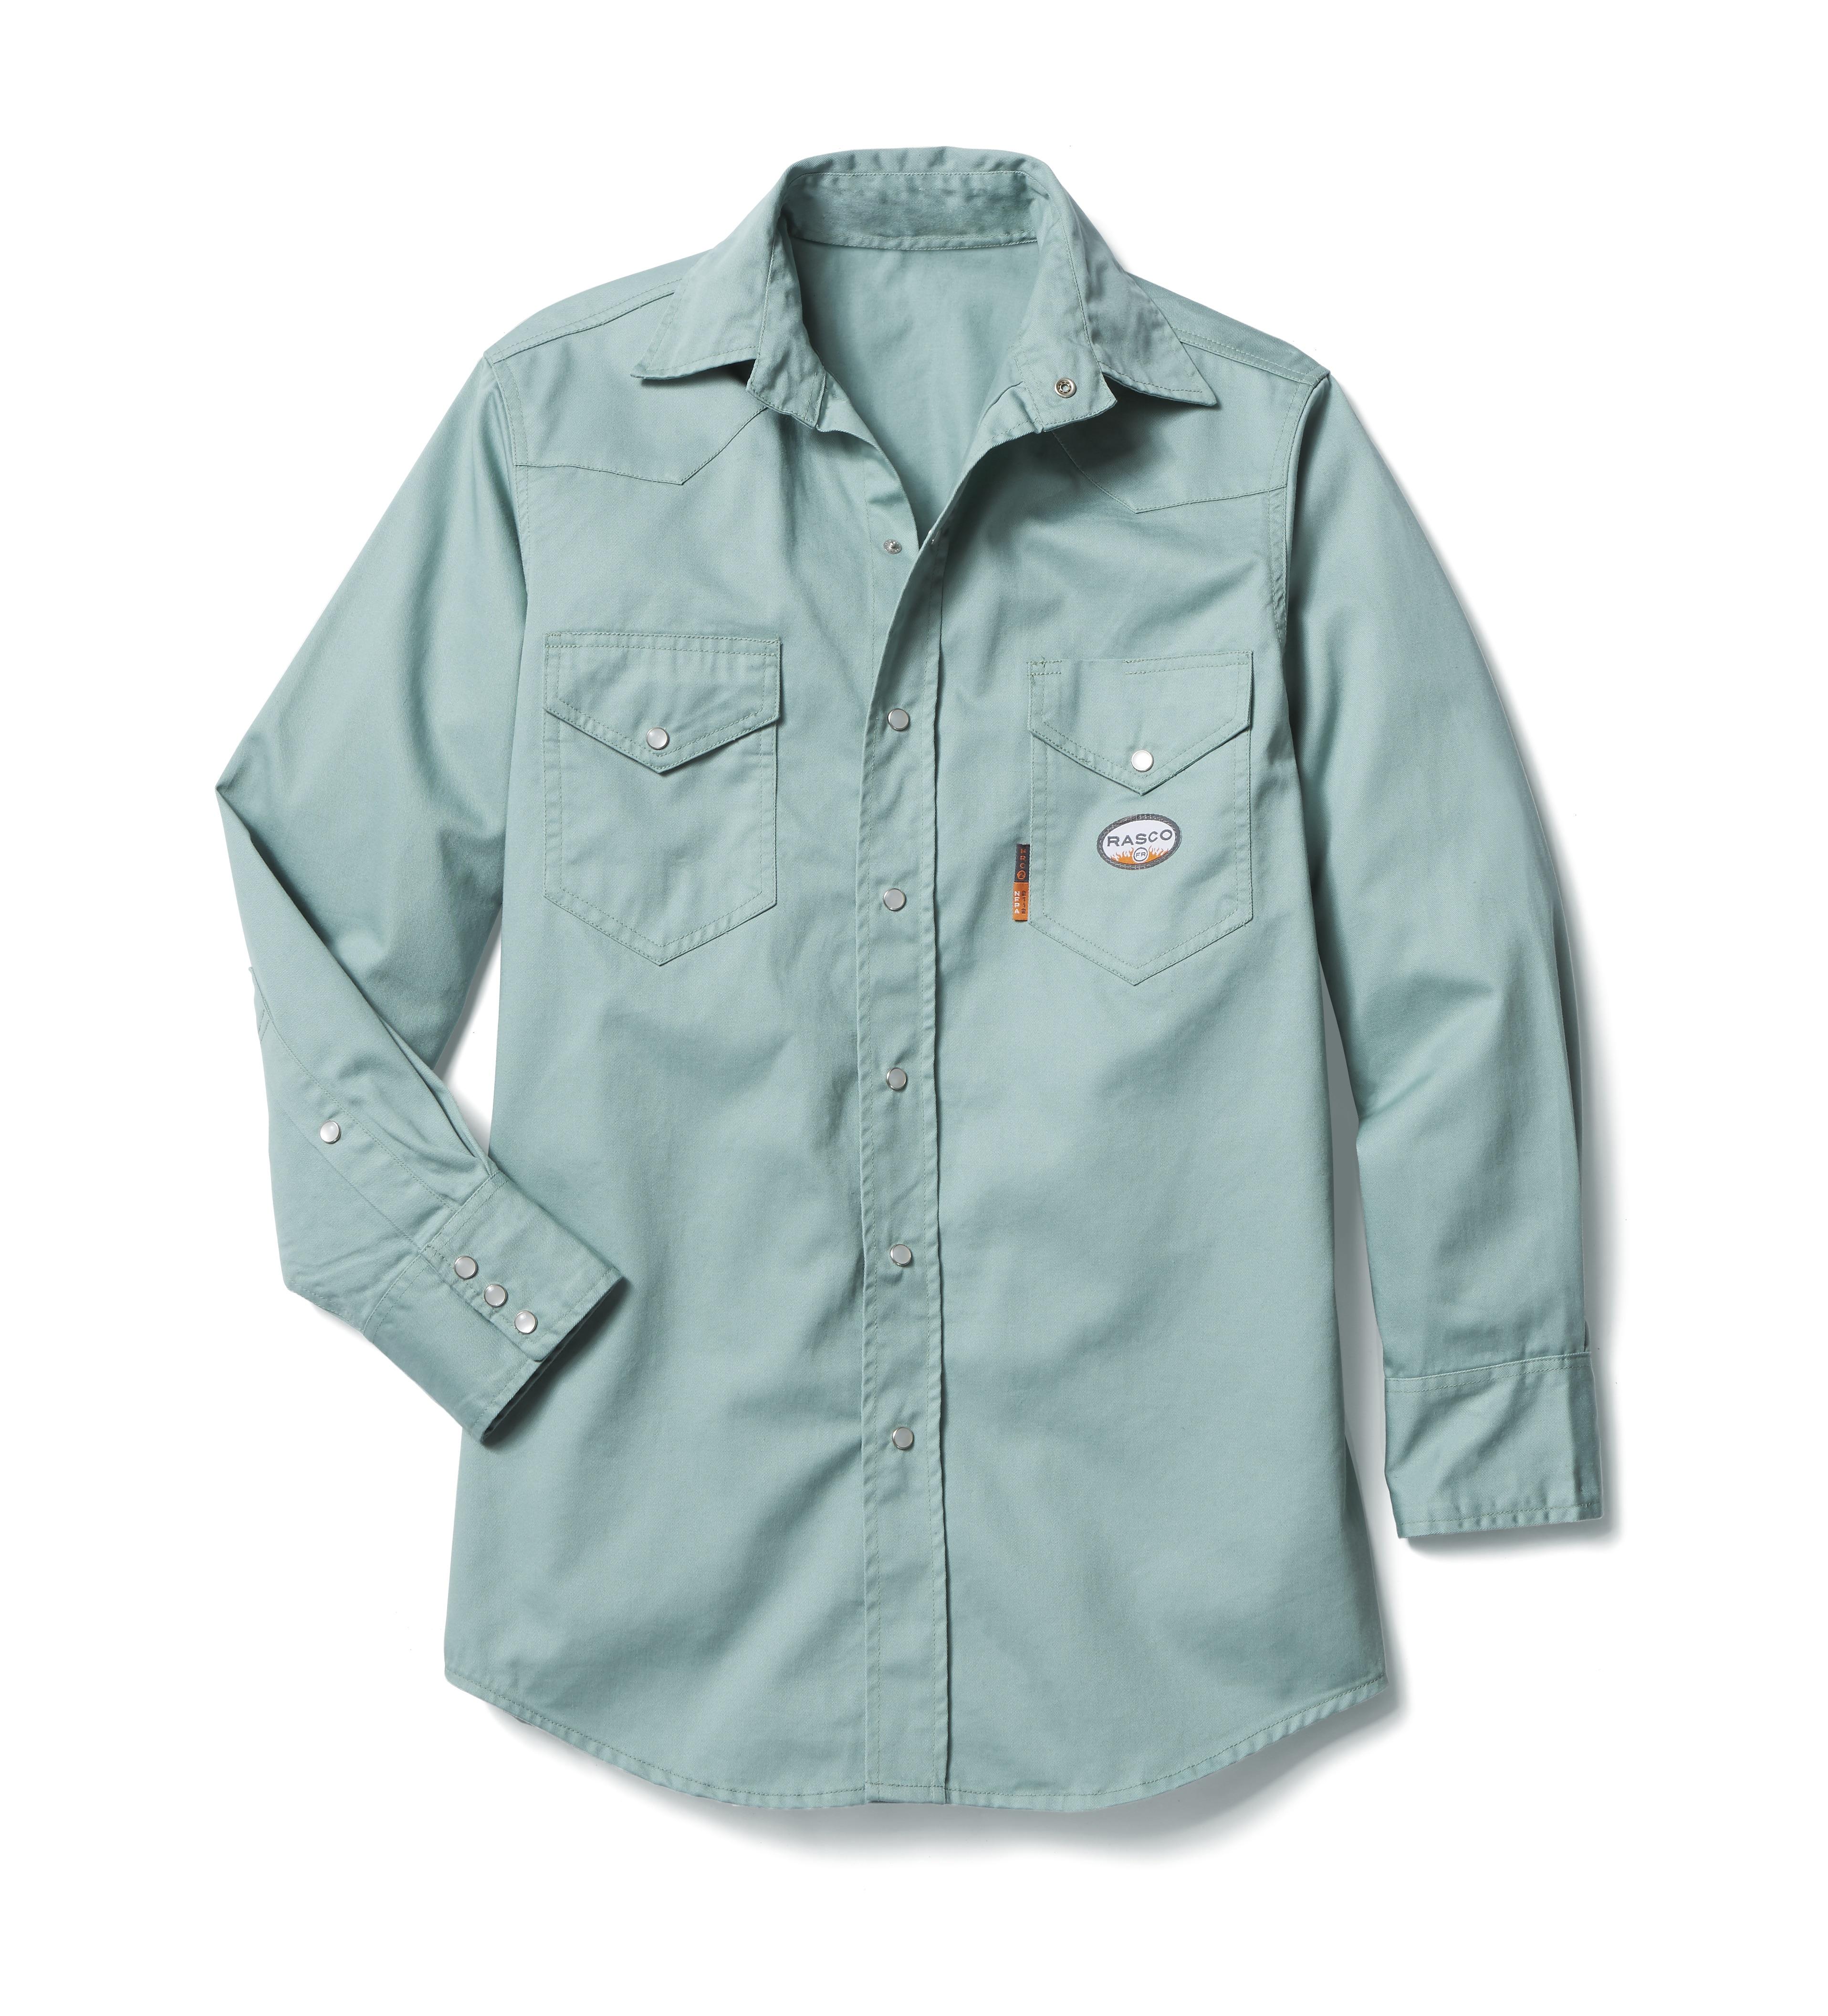 7.5oz Sage Green Fr Shirt-Rasco FR